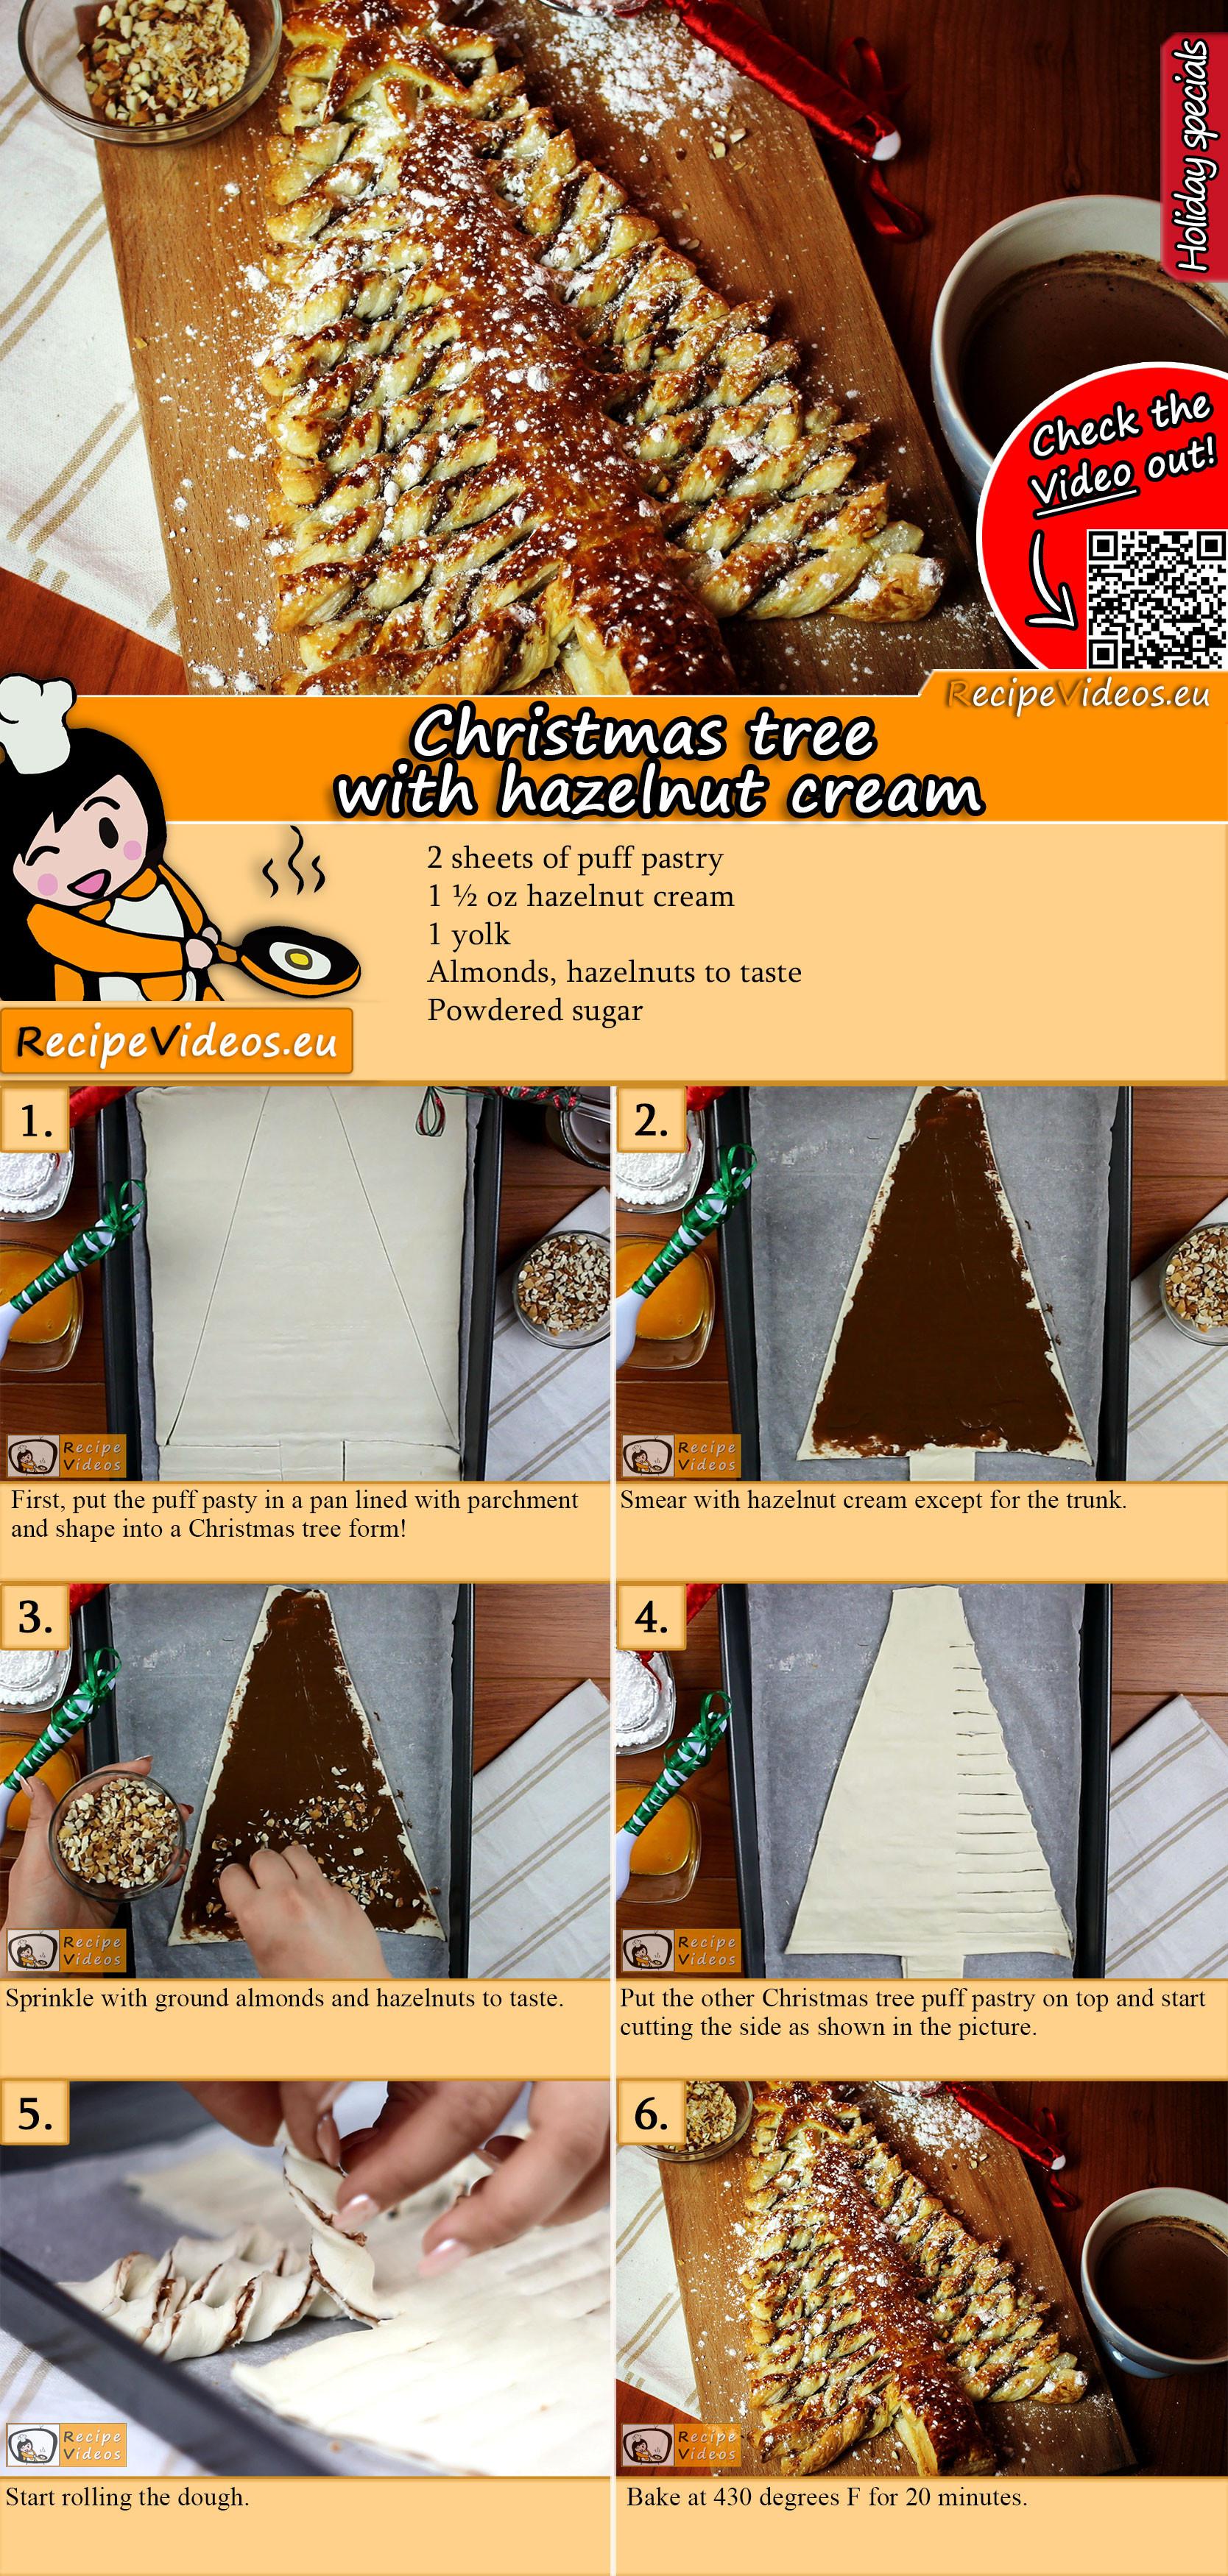 Christmas tree with hazelnut cream recipe with video